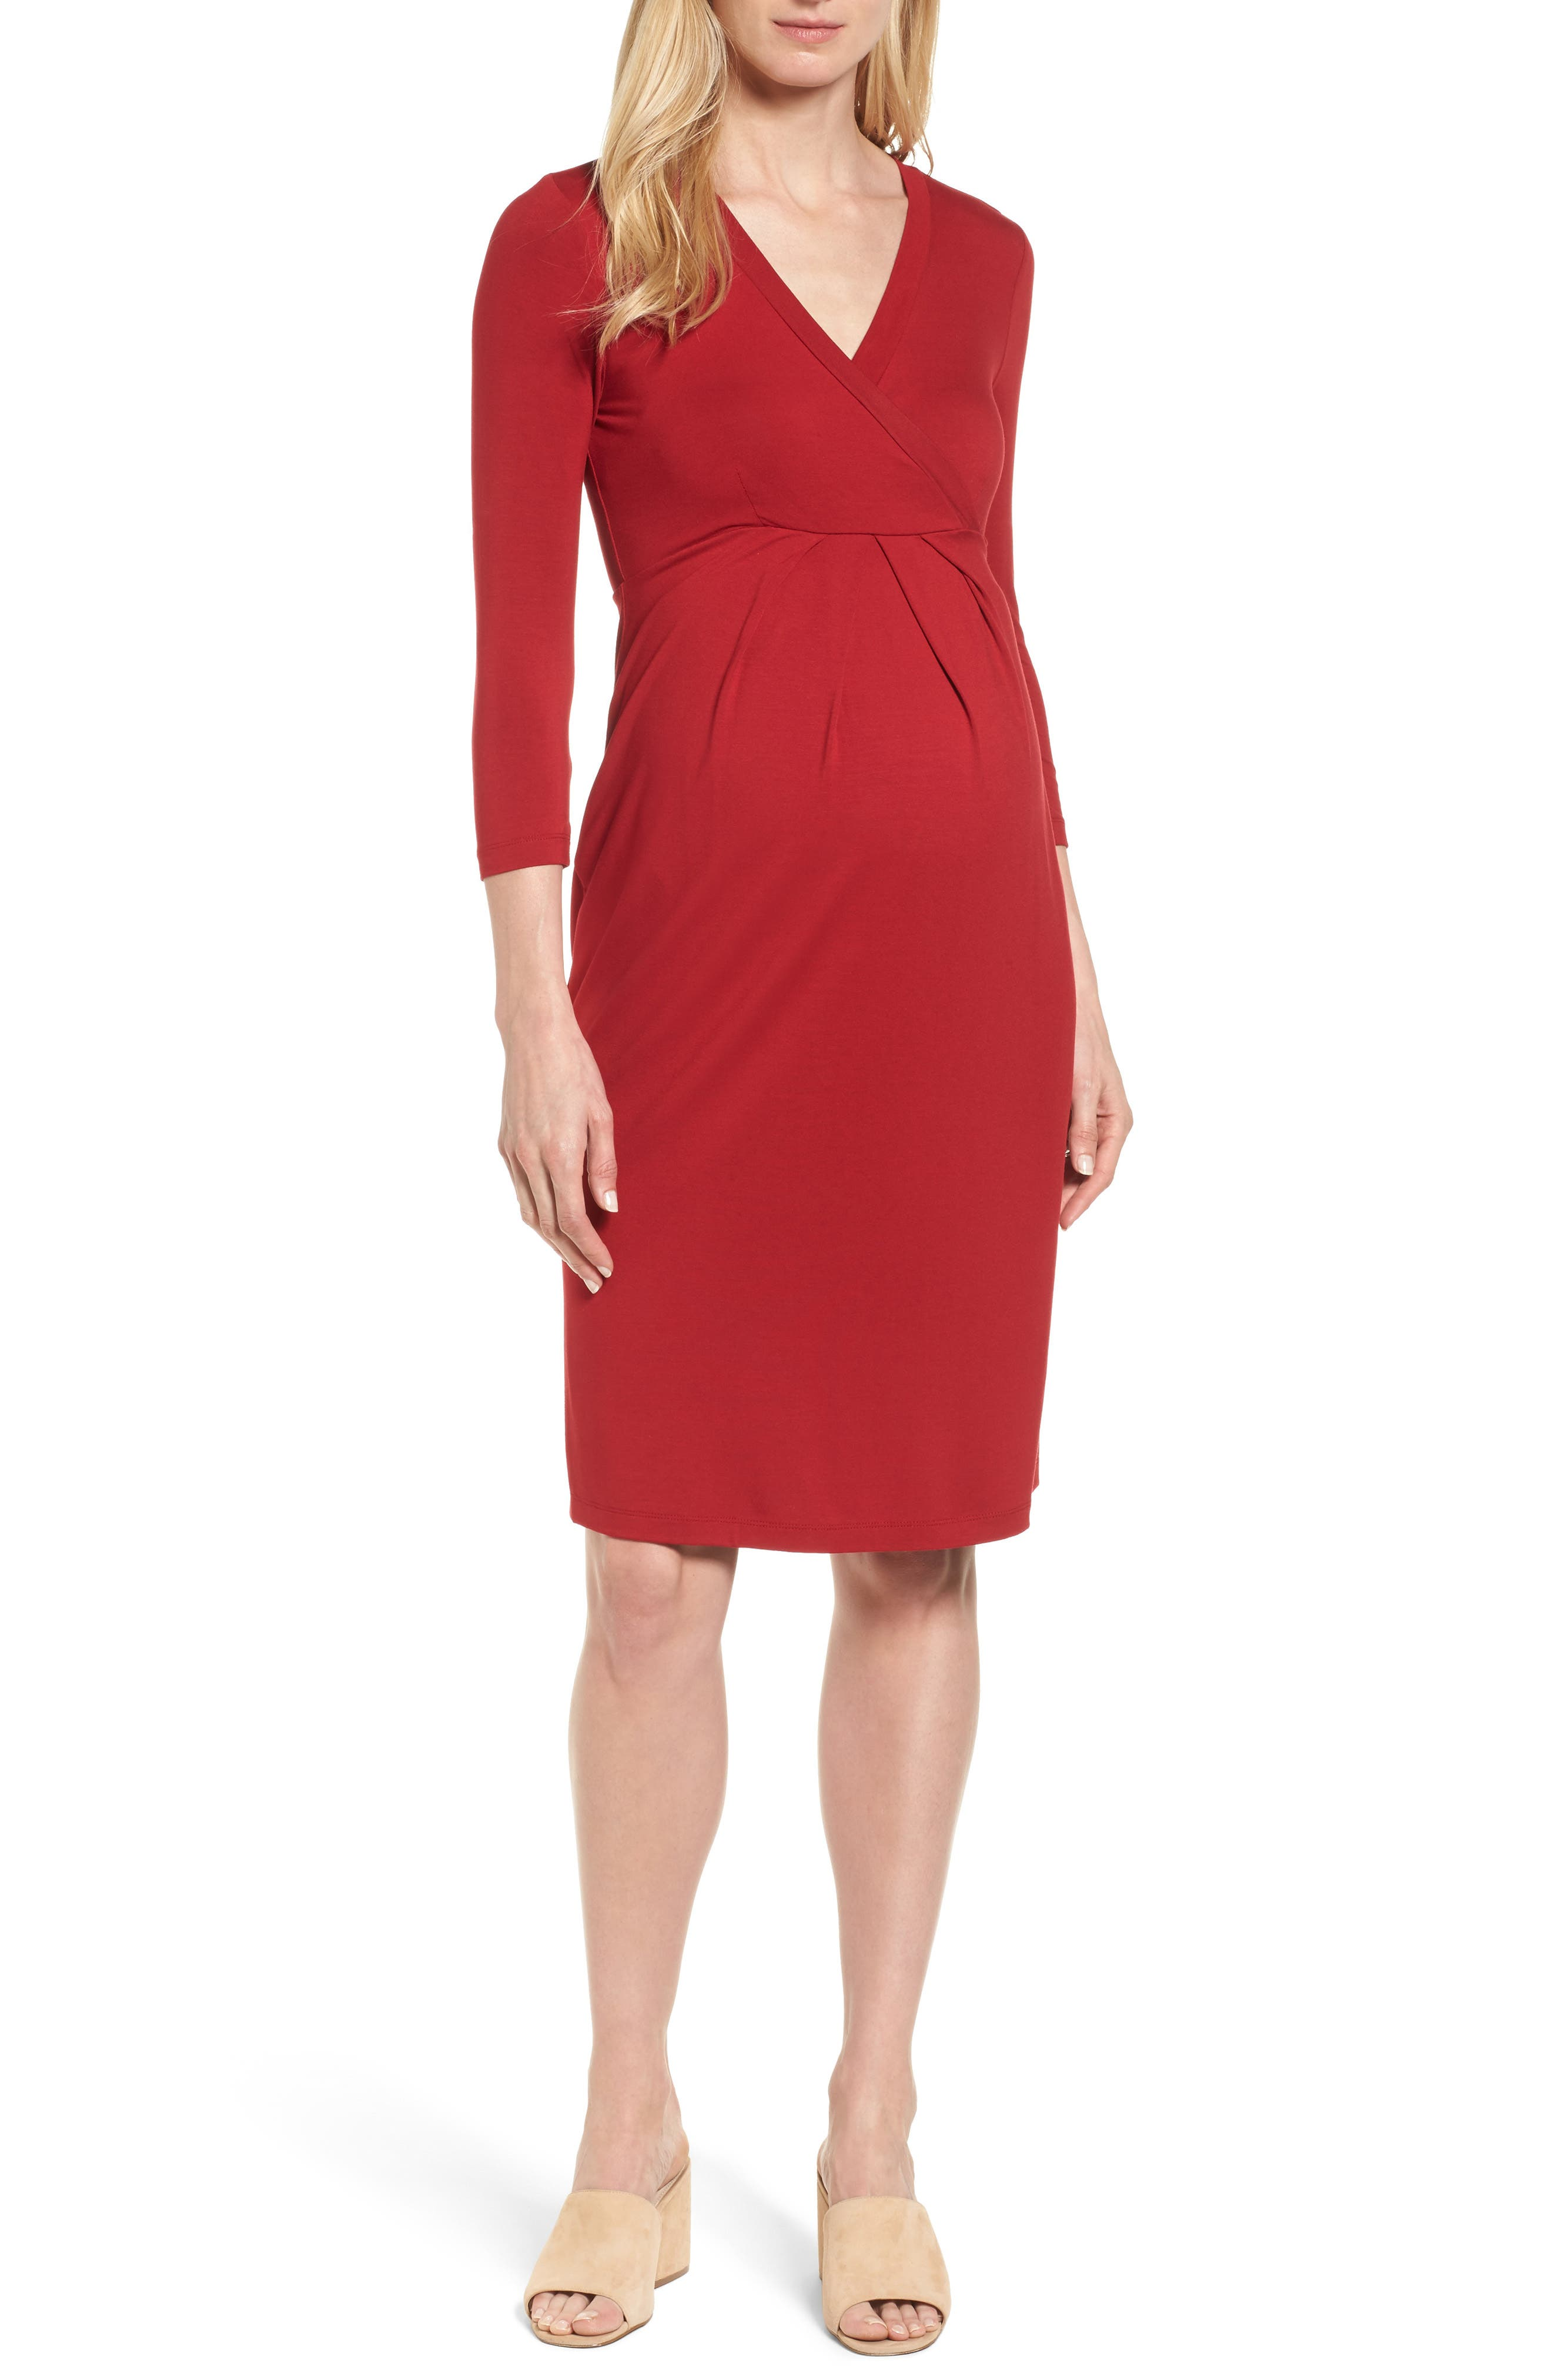 ISABELLA OLIVER Gracia Surplice Maternity Dress, Main, color, CARDAMOM RED